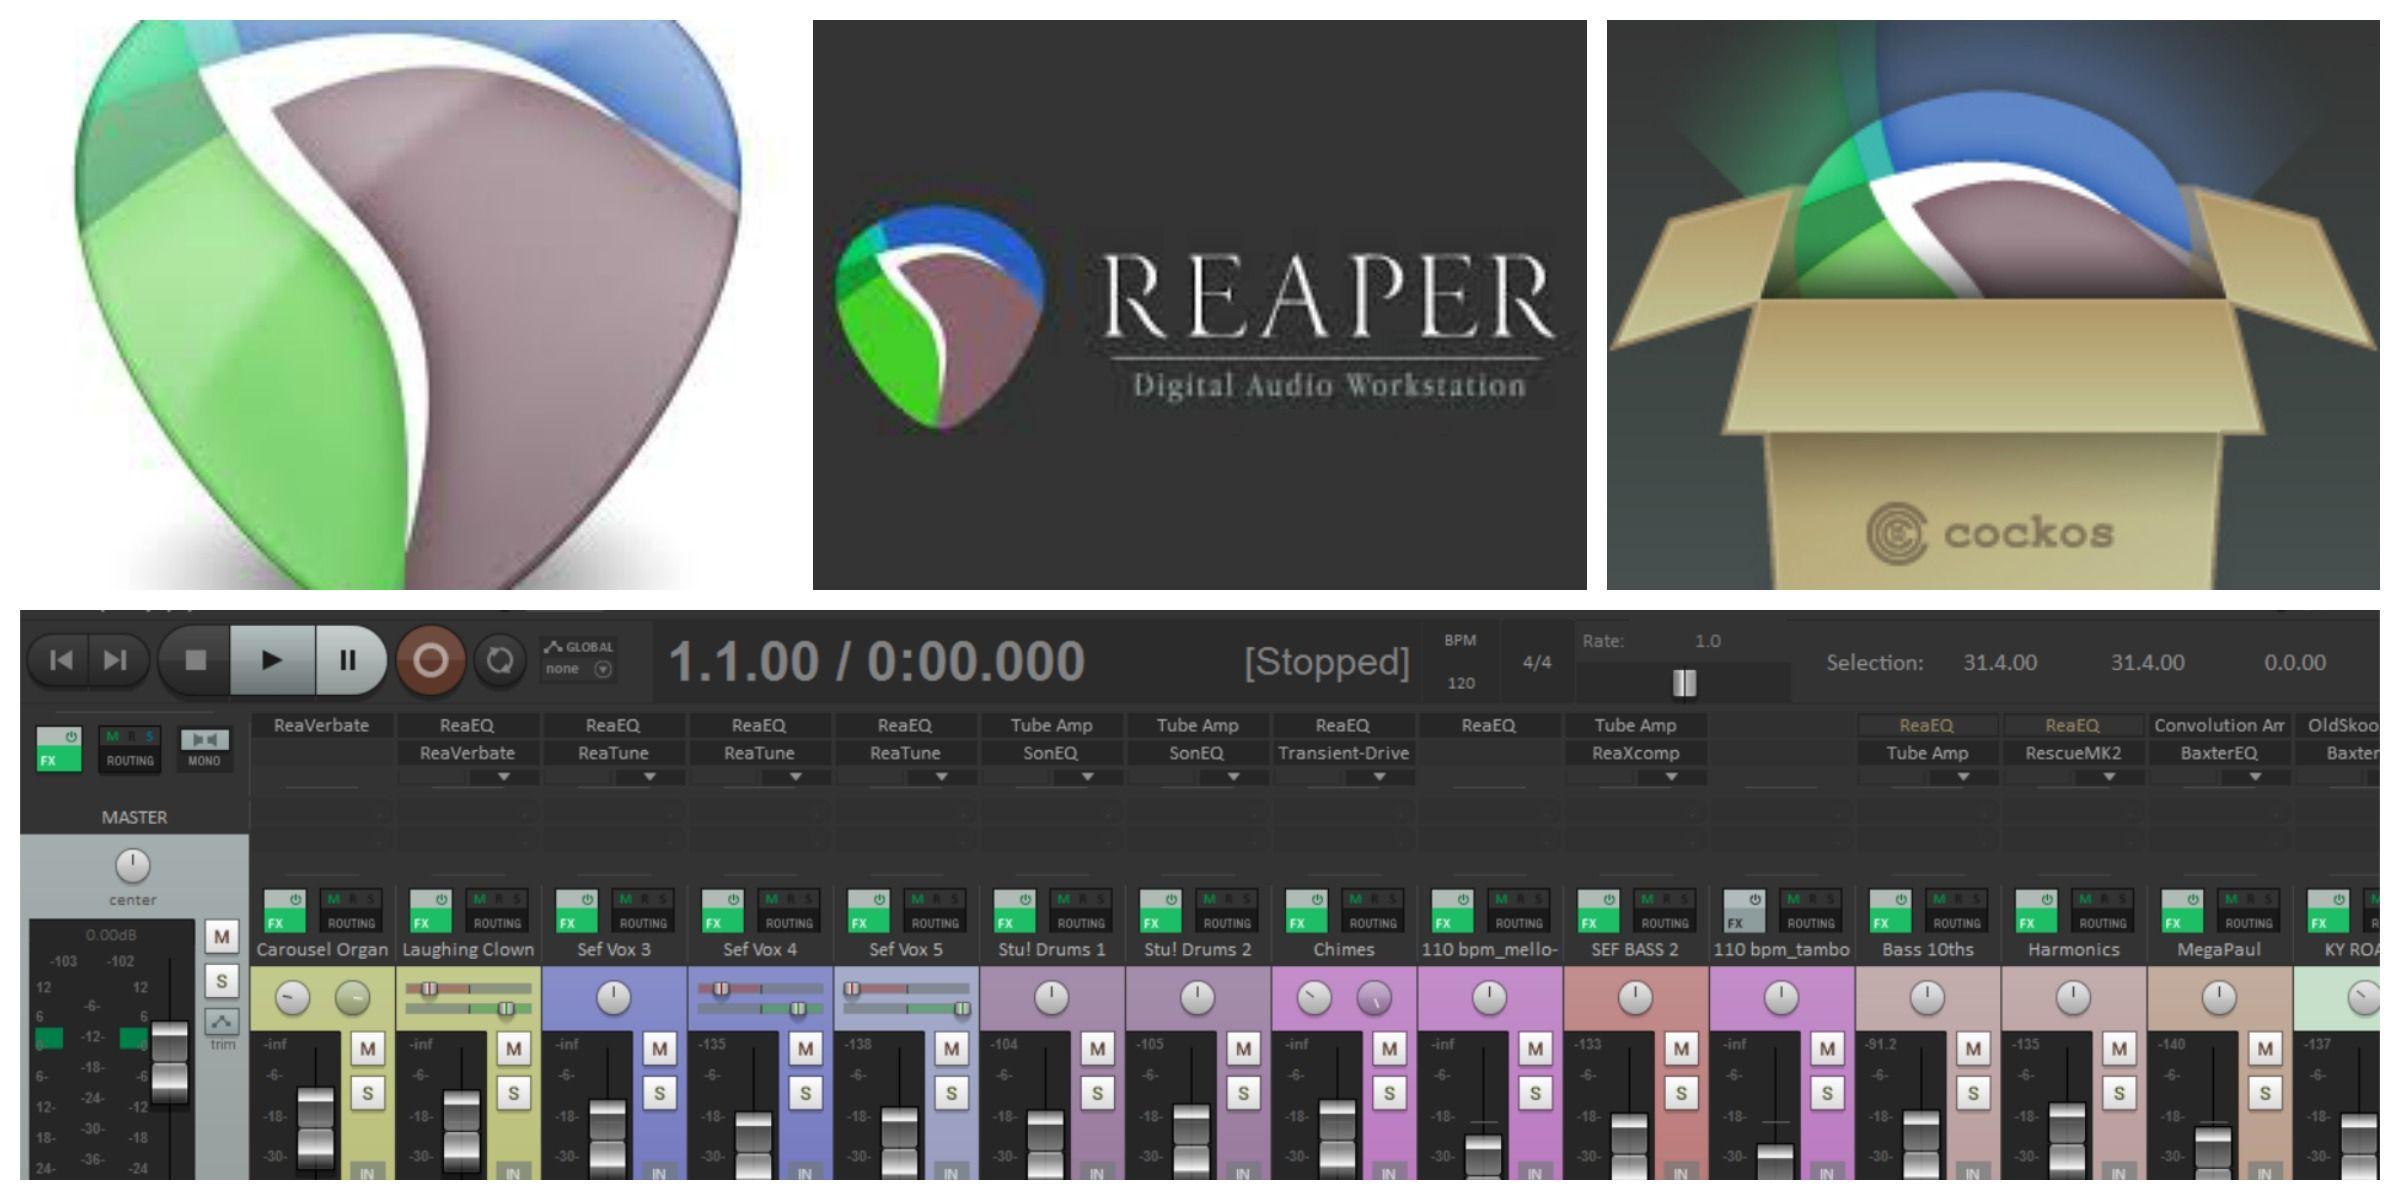 Reaper 5   2016   Digital Audio Workstation (DAW)   Reaper DAW